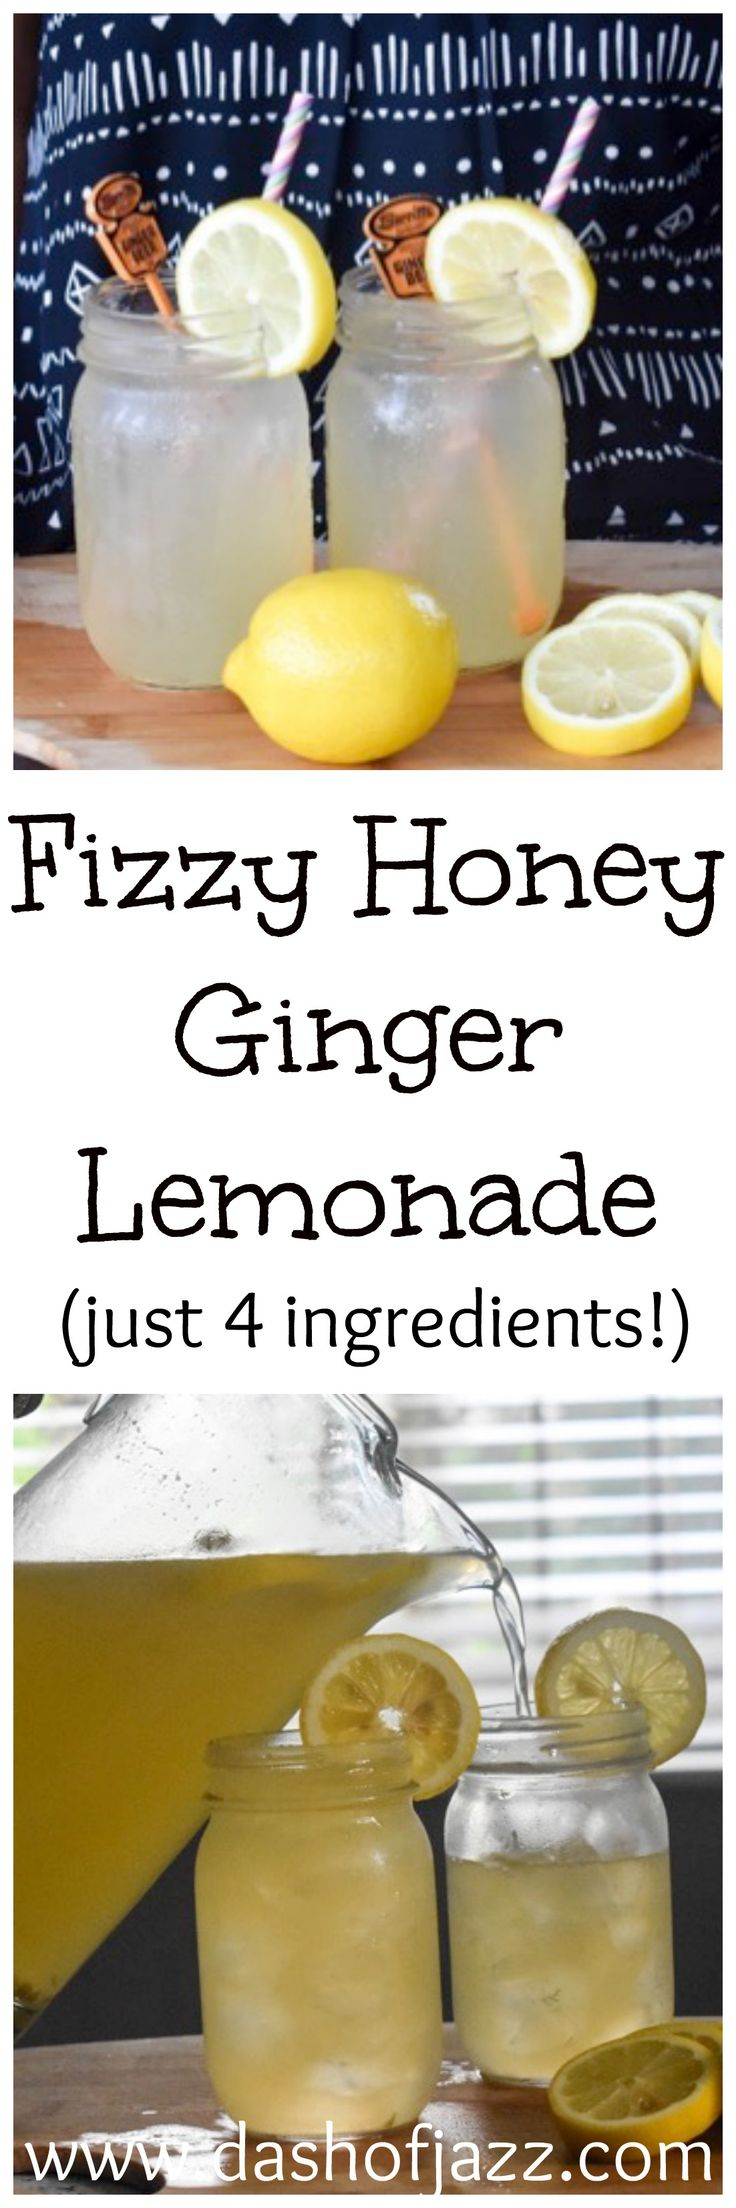 All-natural, 4-ingredient fizzy honey ginger lemonade is your new favorite easy summer drink! Dash of Jazz